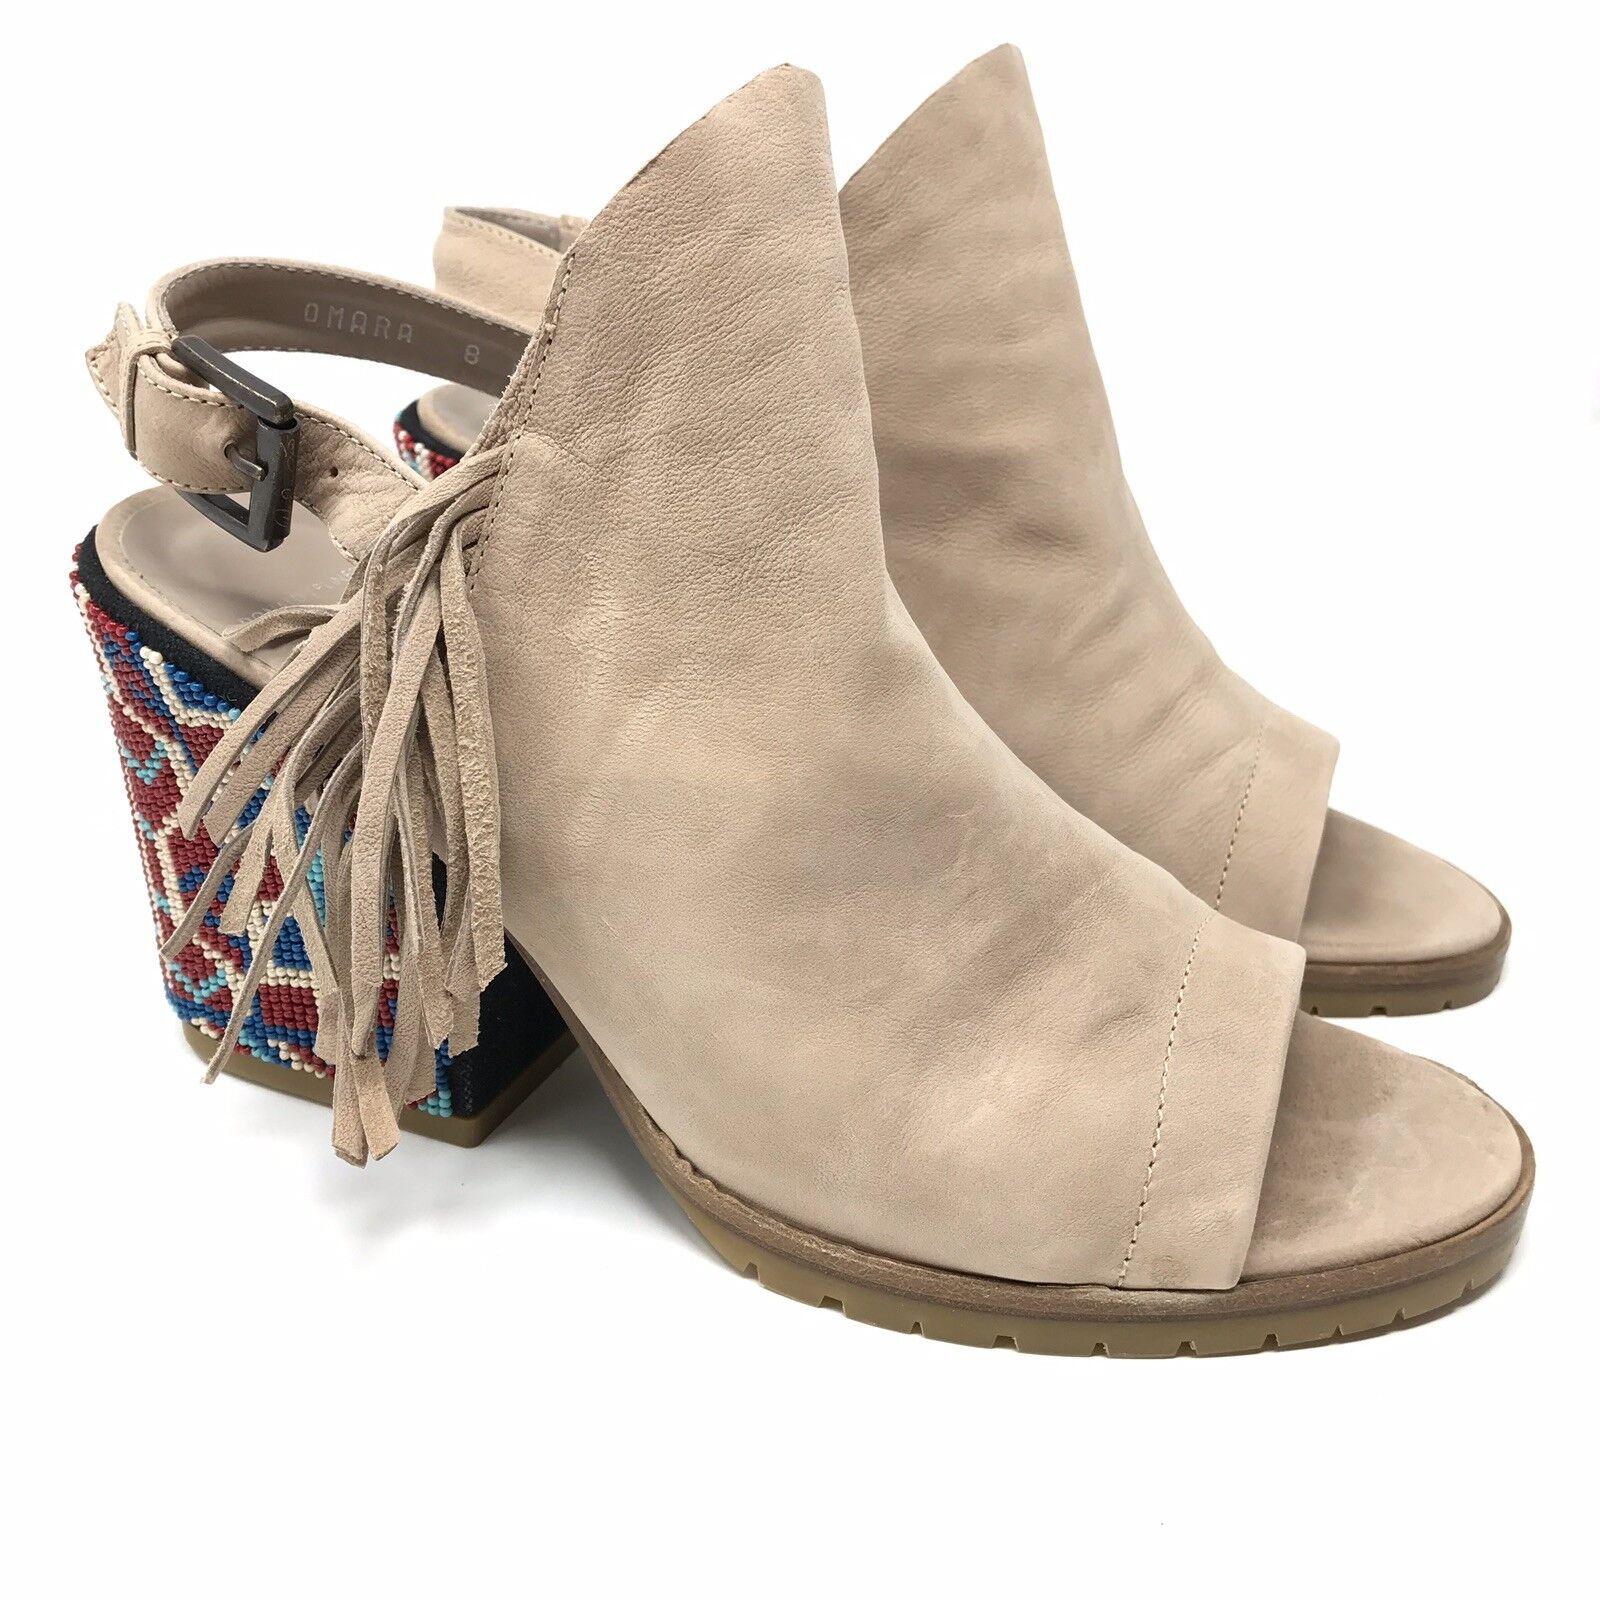 NWOB Donald Pliner femmes 8B Omara Slingback Heeled Sandals Beige Nubuck Beaded